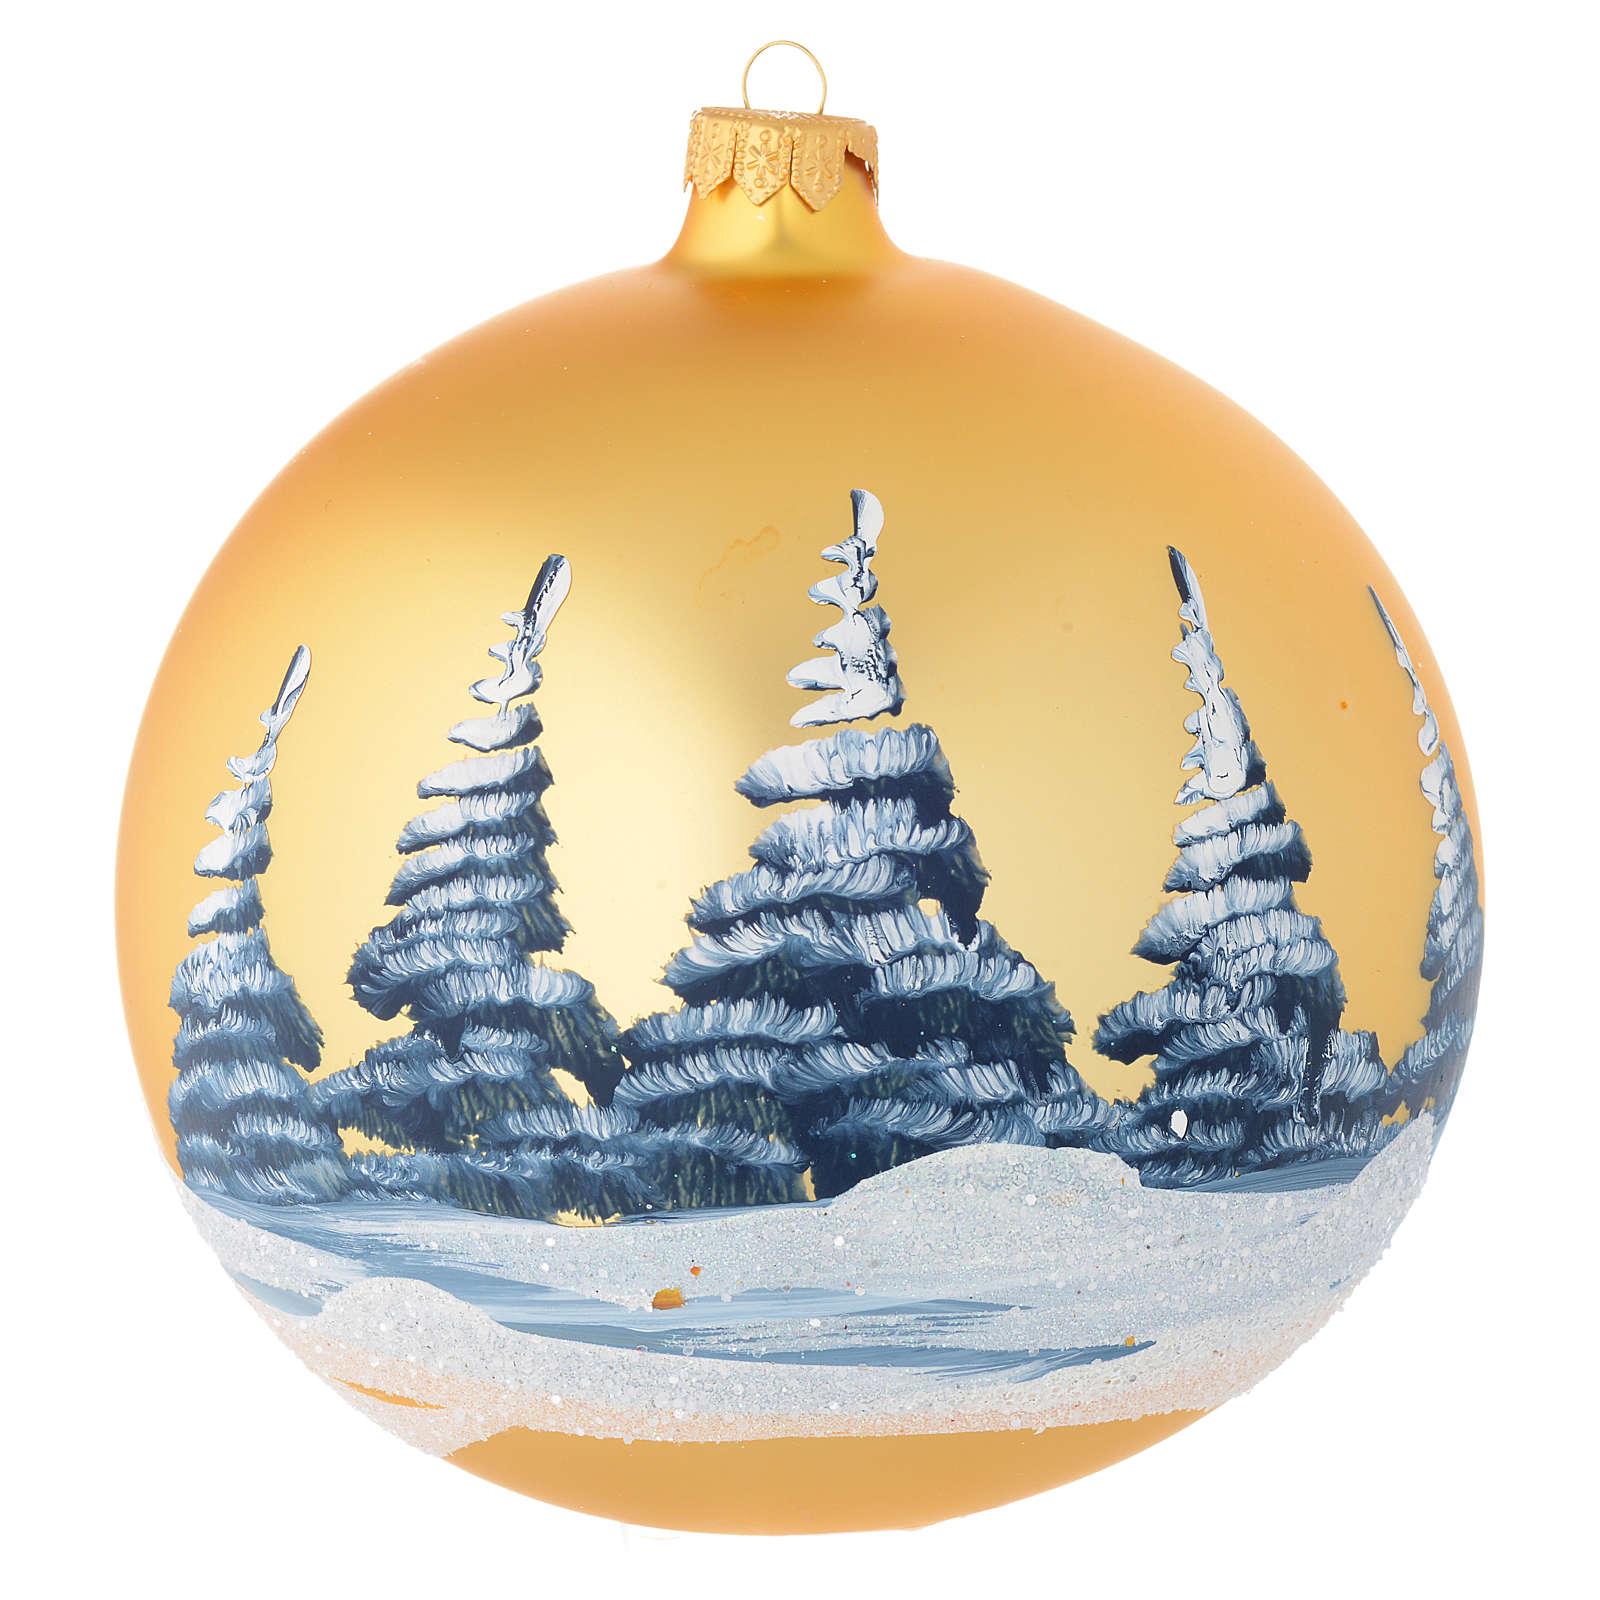 Bola de Navidad vidrio soplado oro paisaje decoupage 150 mm 4